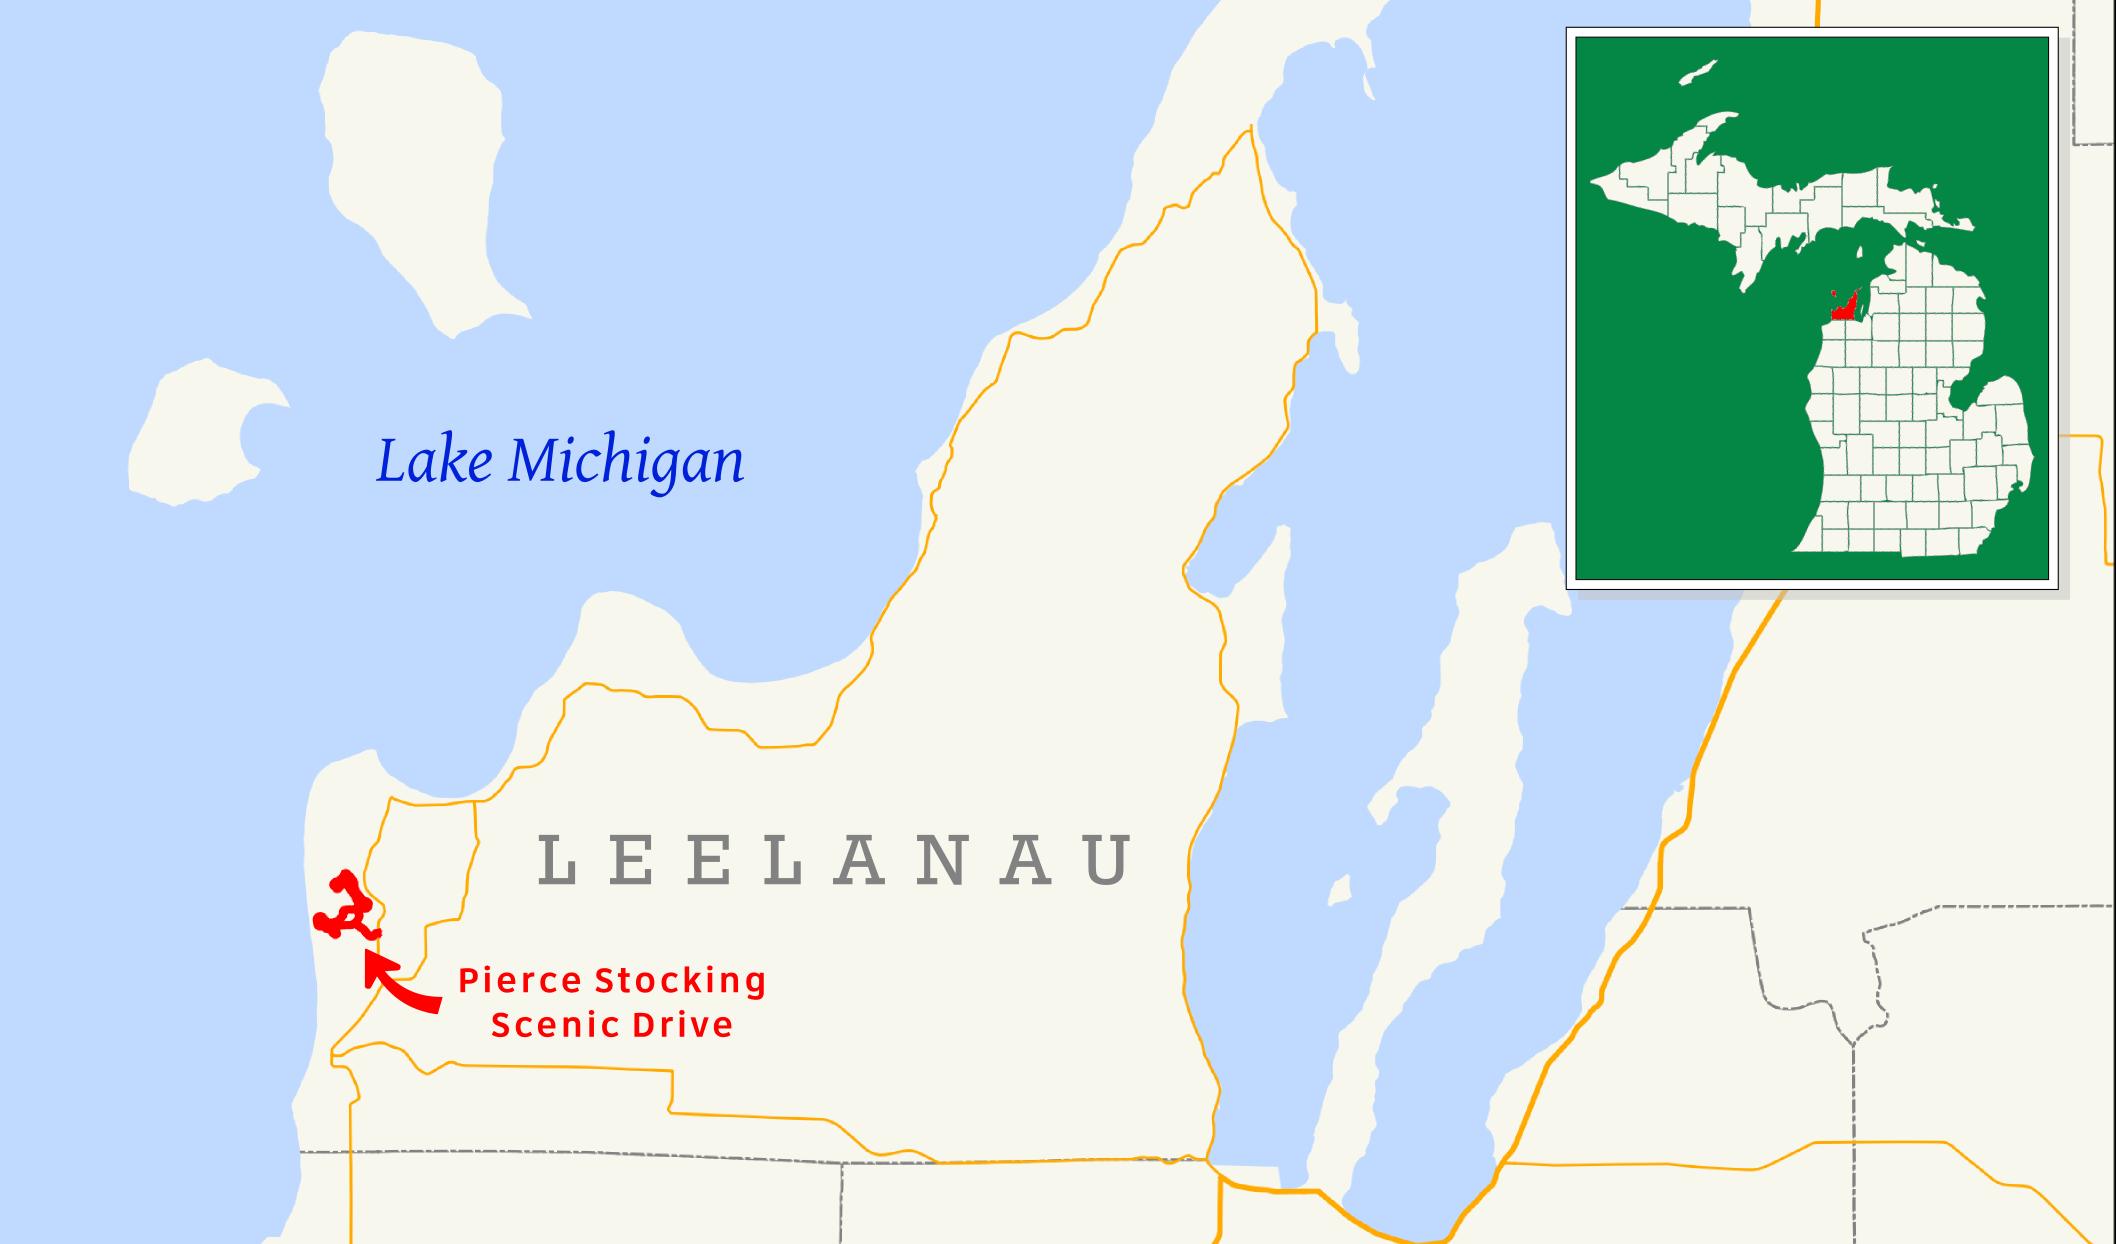 Pierce Stocking Scenic Drive - Wikipedia